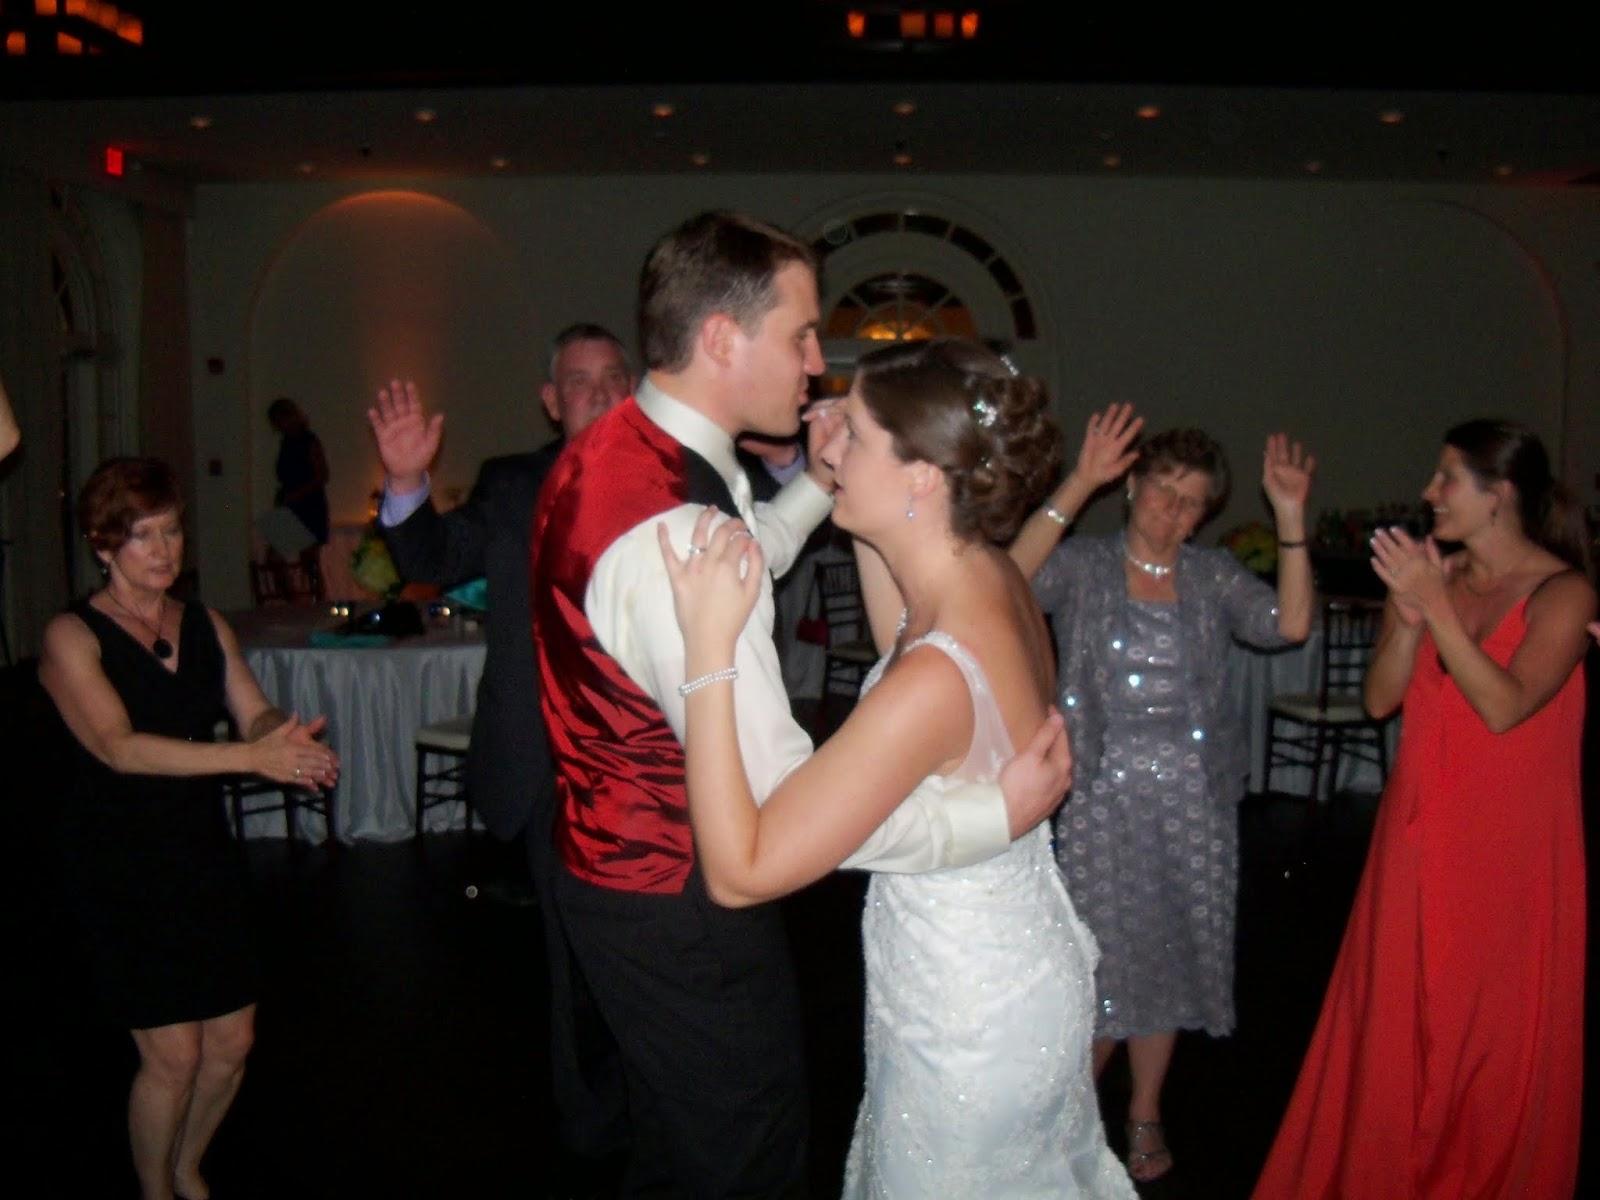 Franks Wedding - 116_6035.JPG